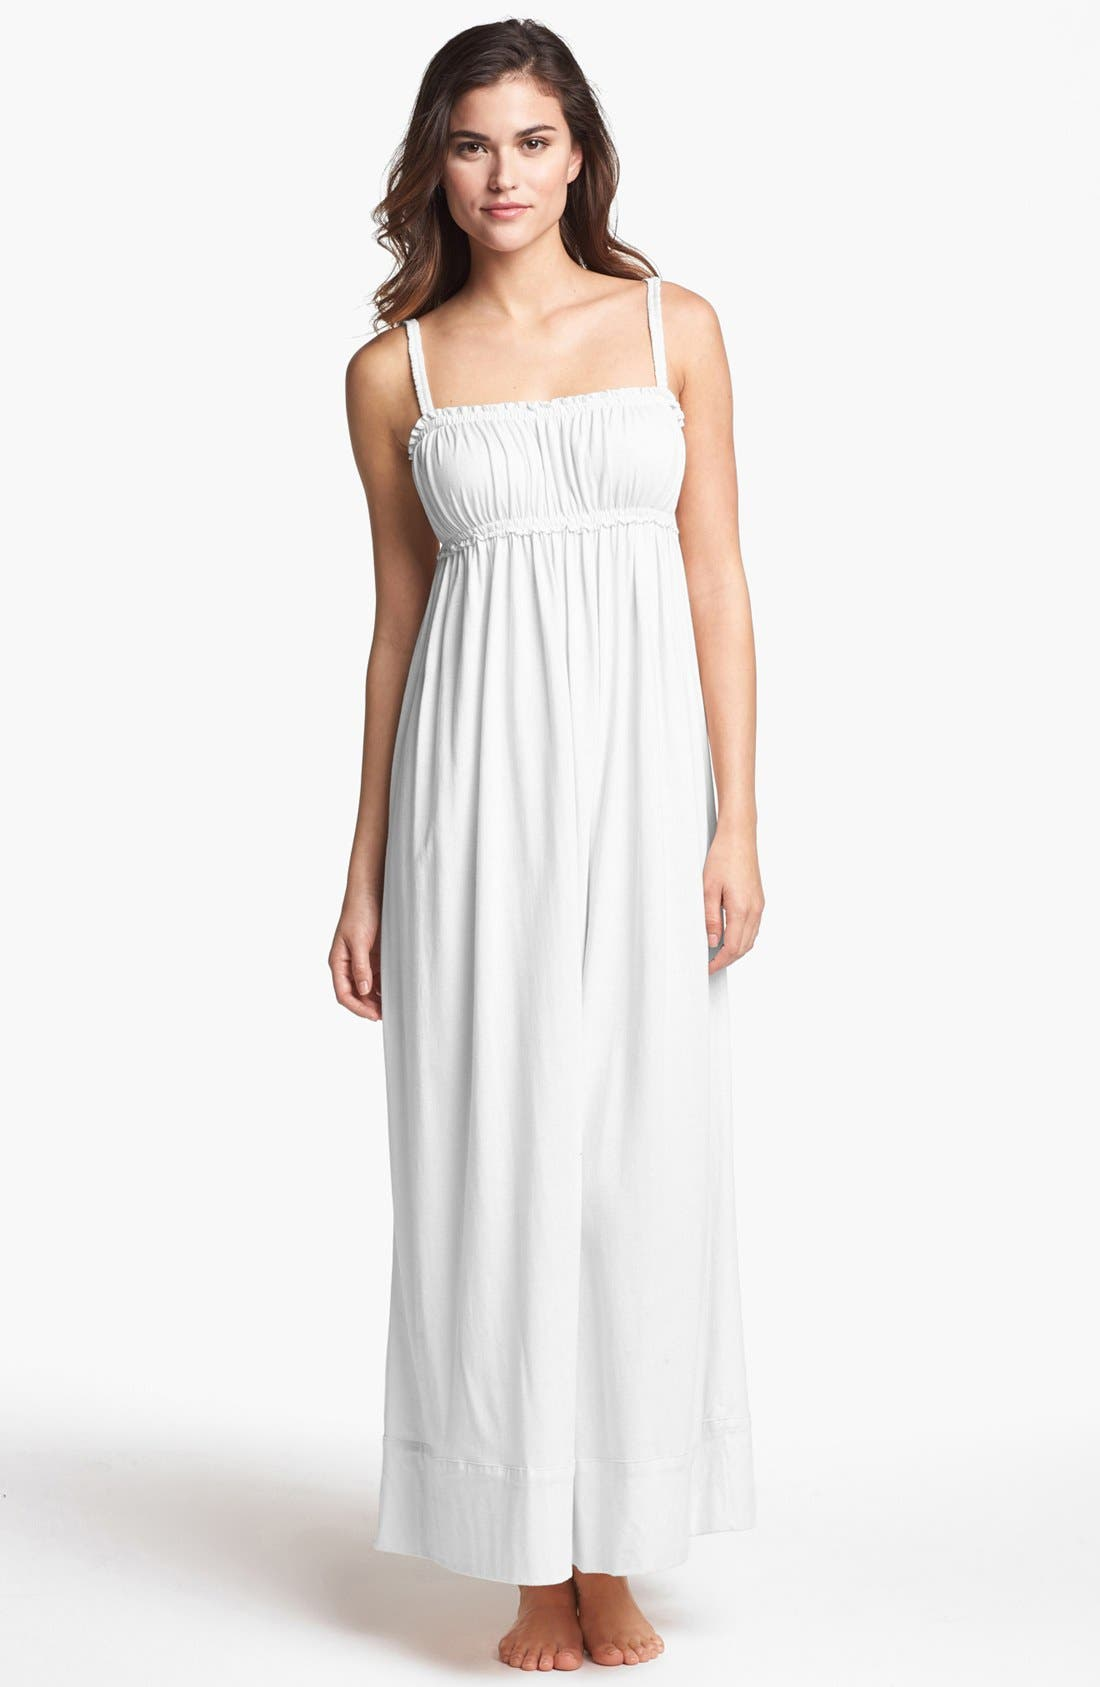 Main Image - Donna Karan 'Casual Luxe' Long Knit Nightgown